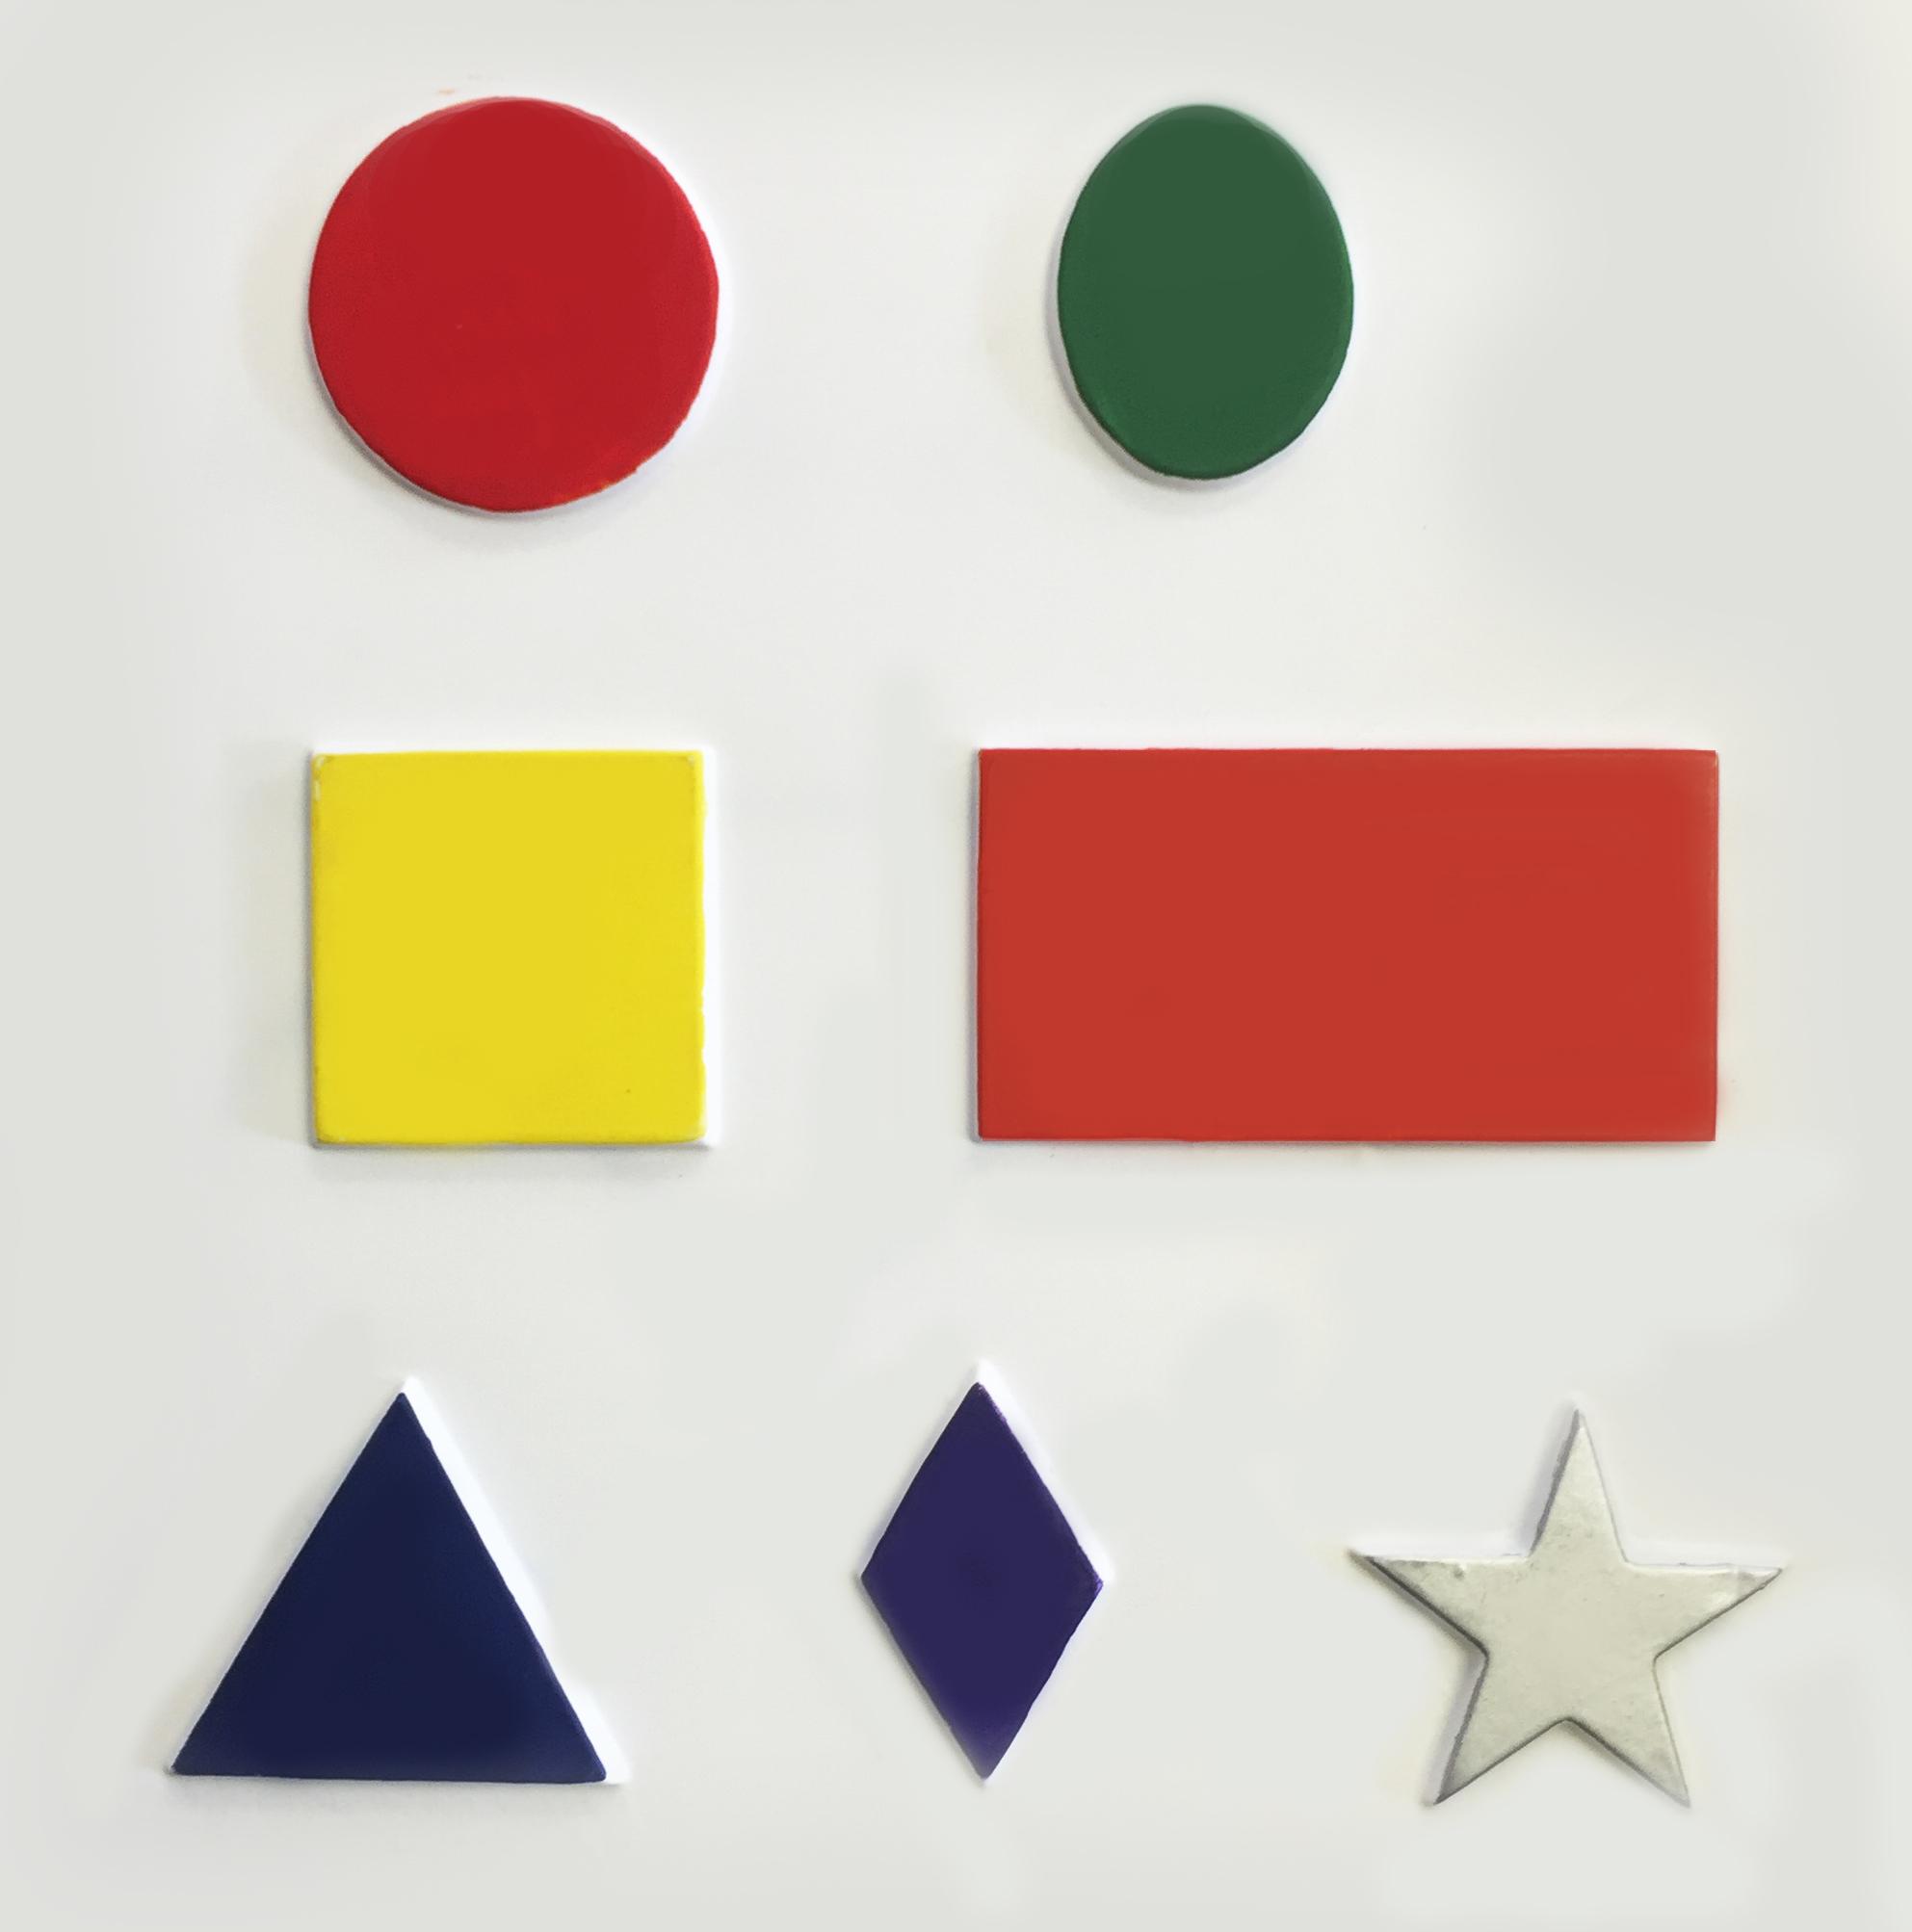 Shapes tactile picutre, oval, circle, square, rectangle, triangle, diamond, star.